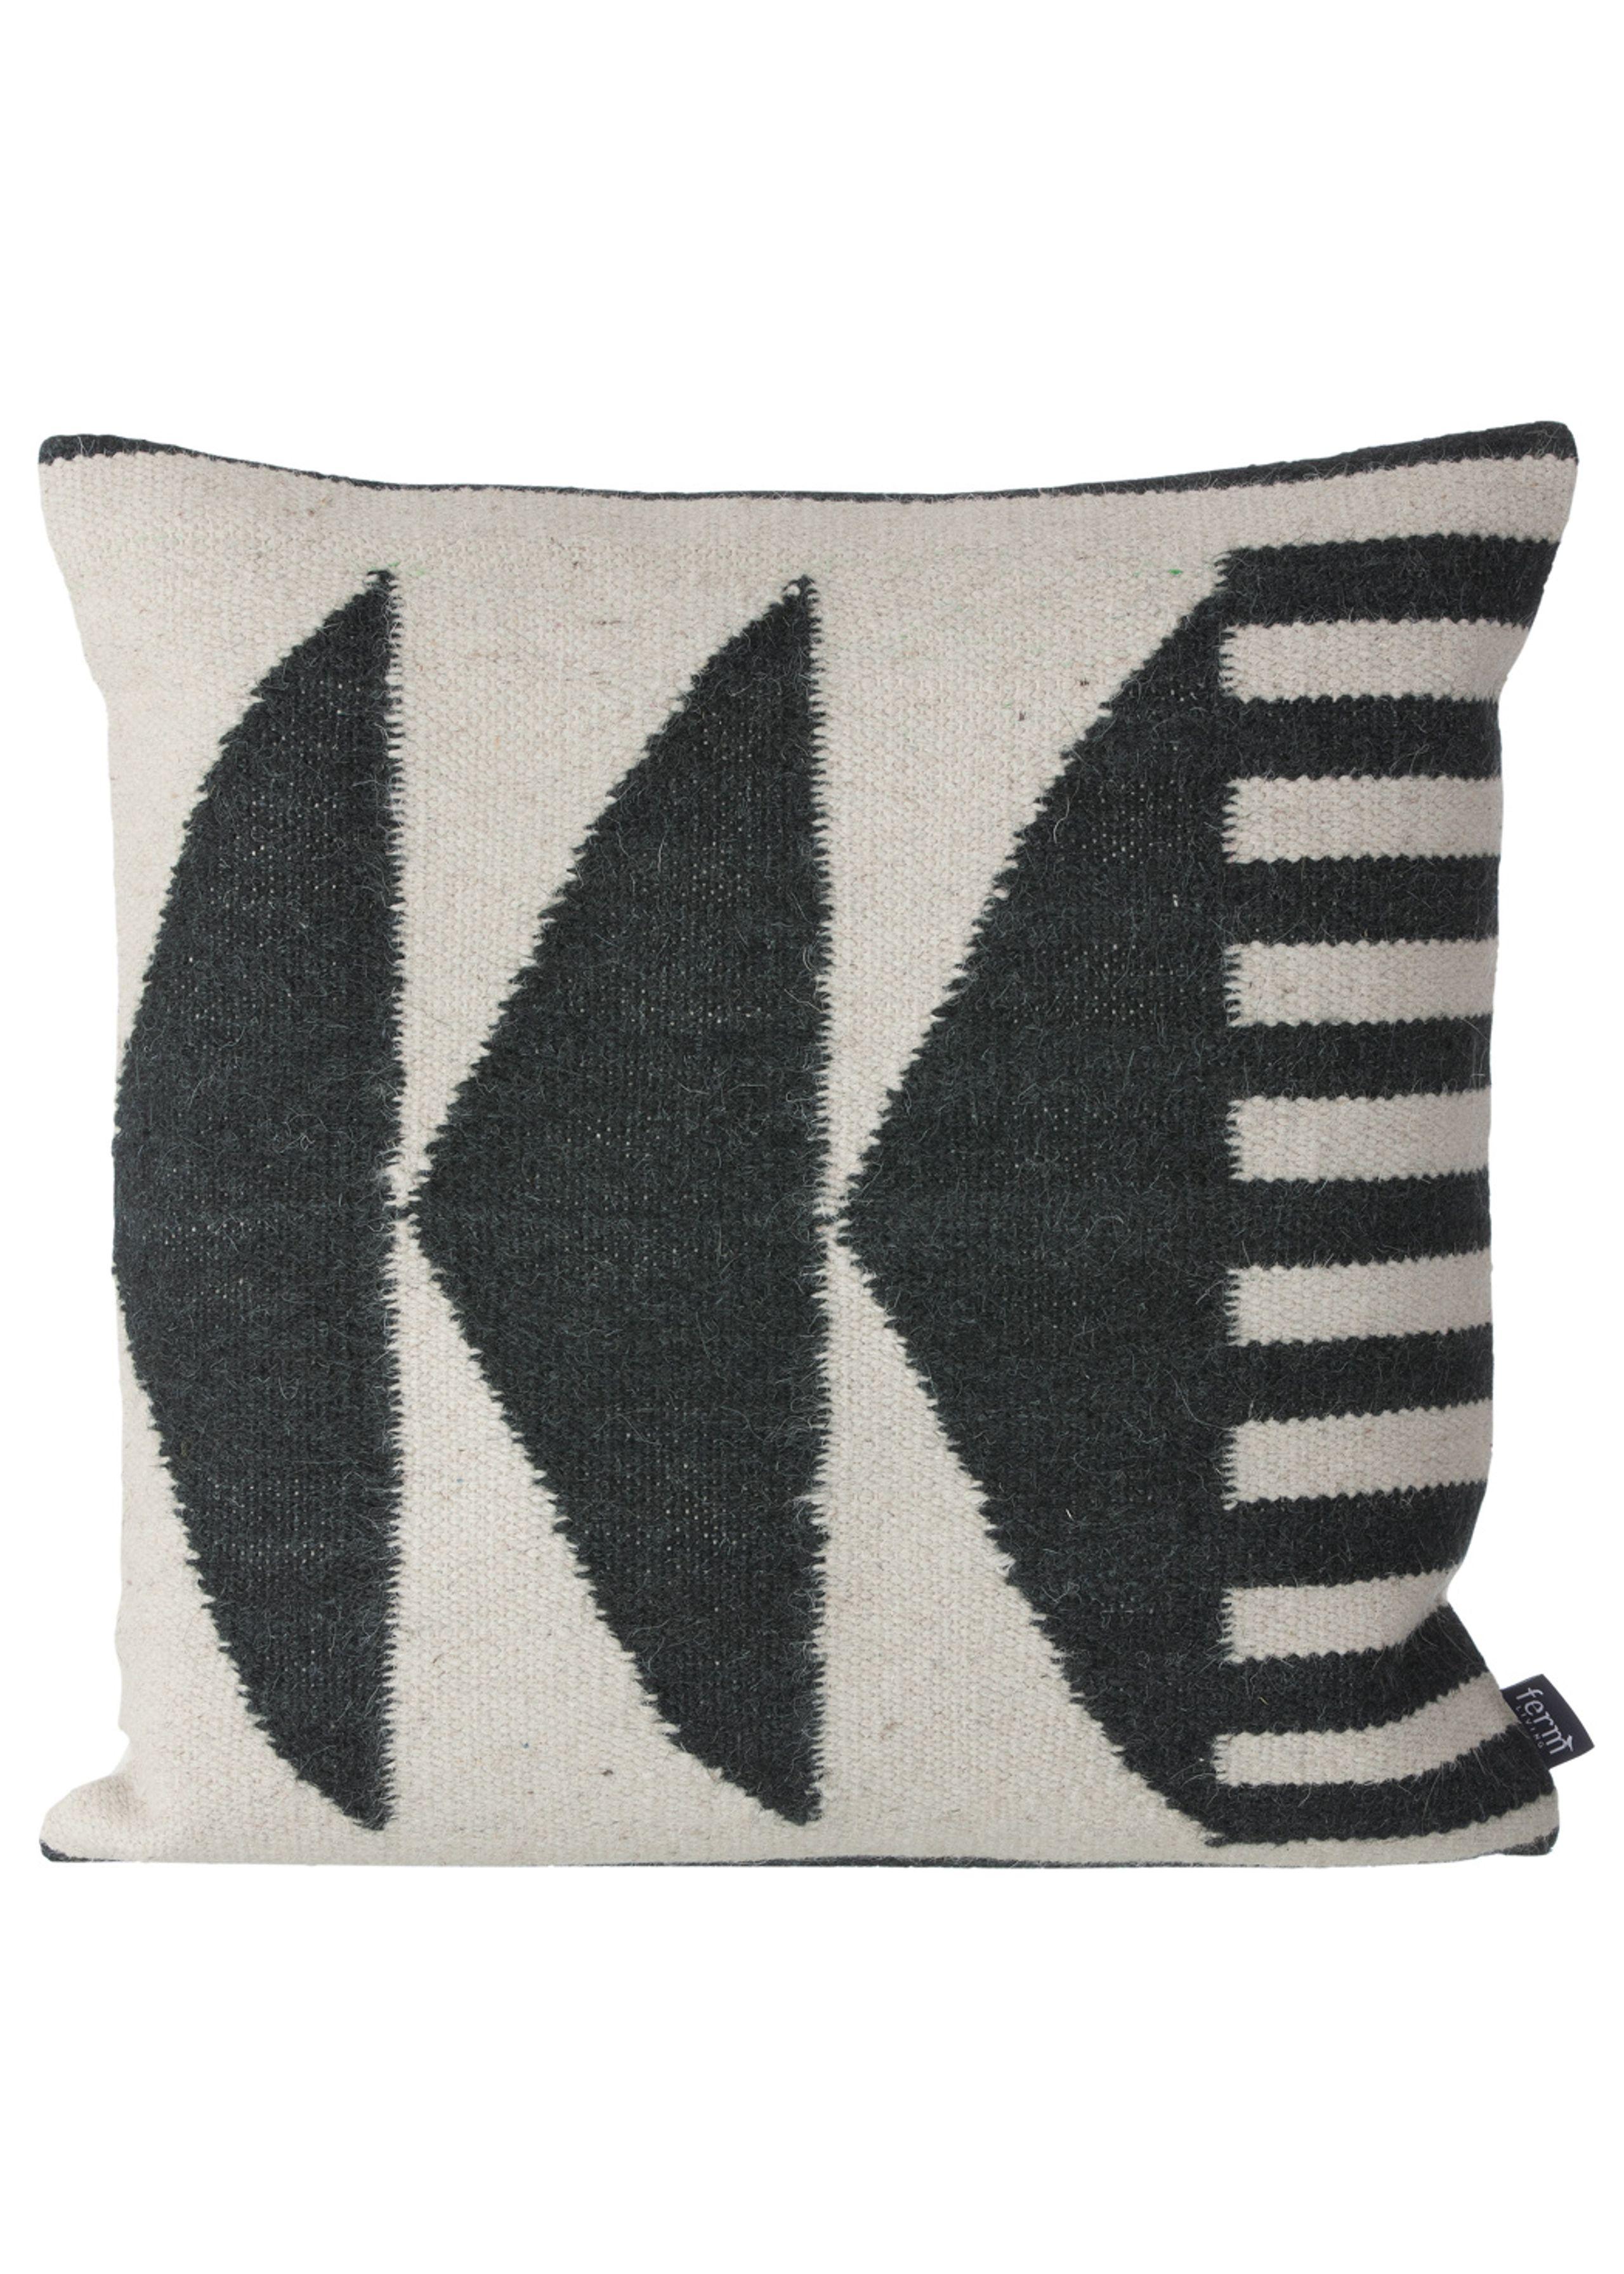 Image of   Kelim Cushion Black Triangles